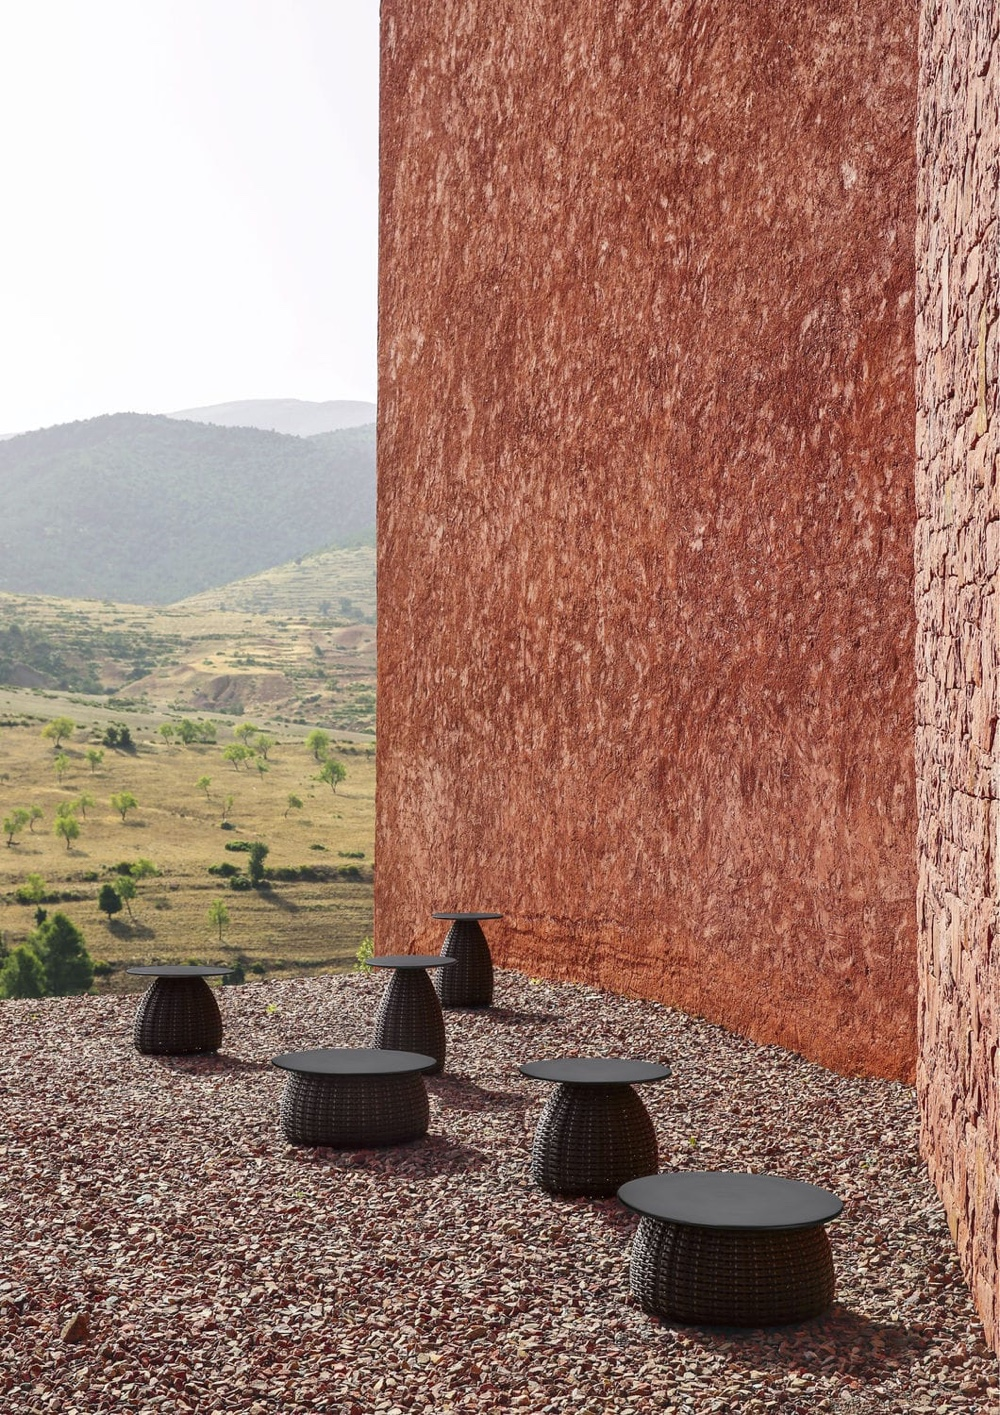 PORCINI by Italian designer Lorenza Bozzoli for DEDON. Image via ArchiExpo.